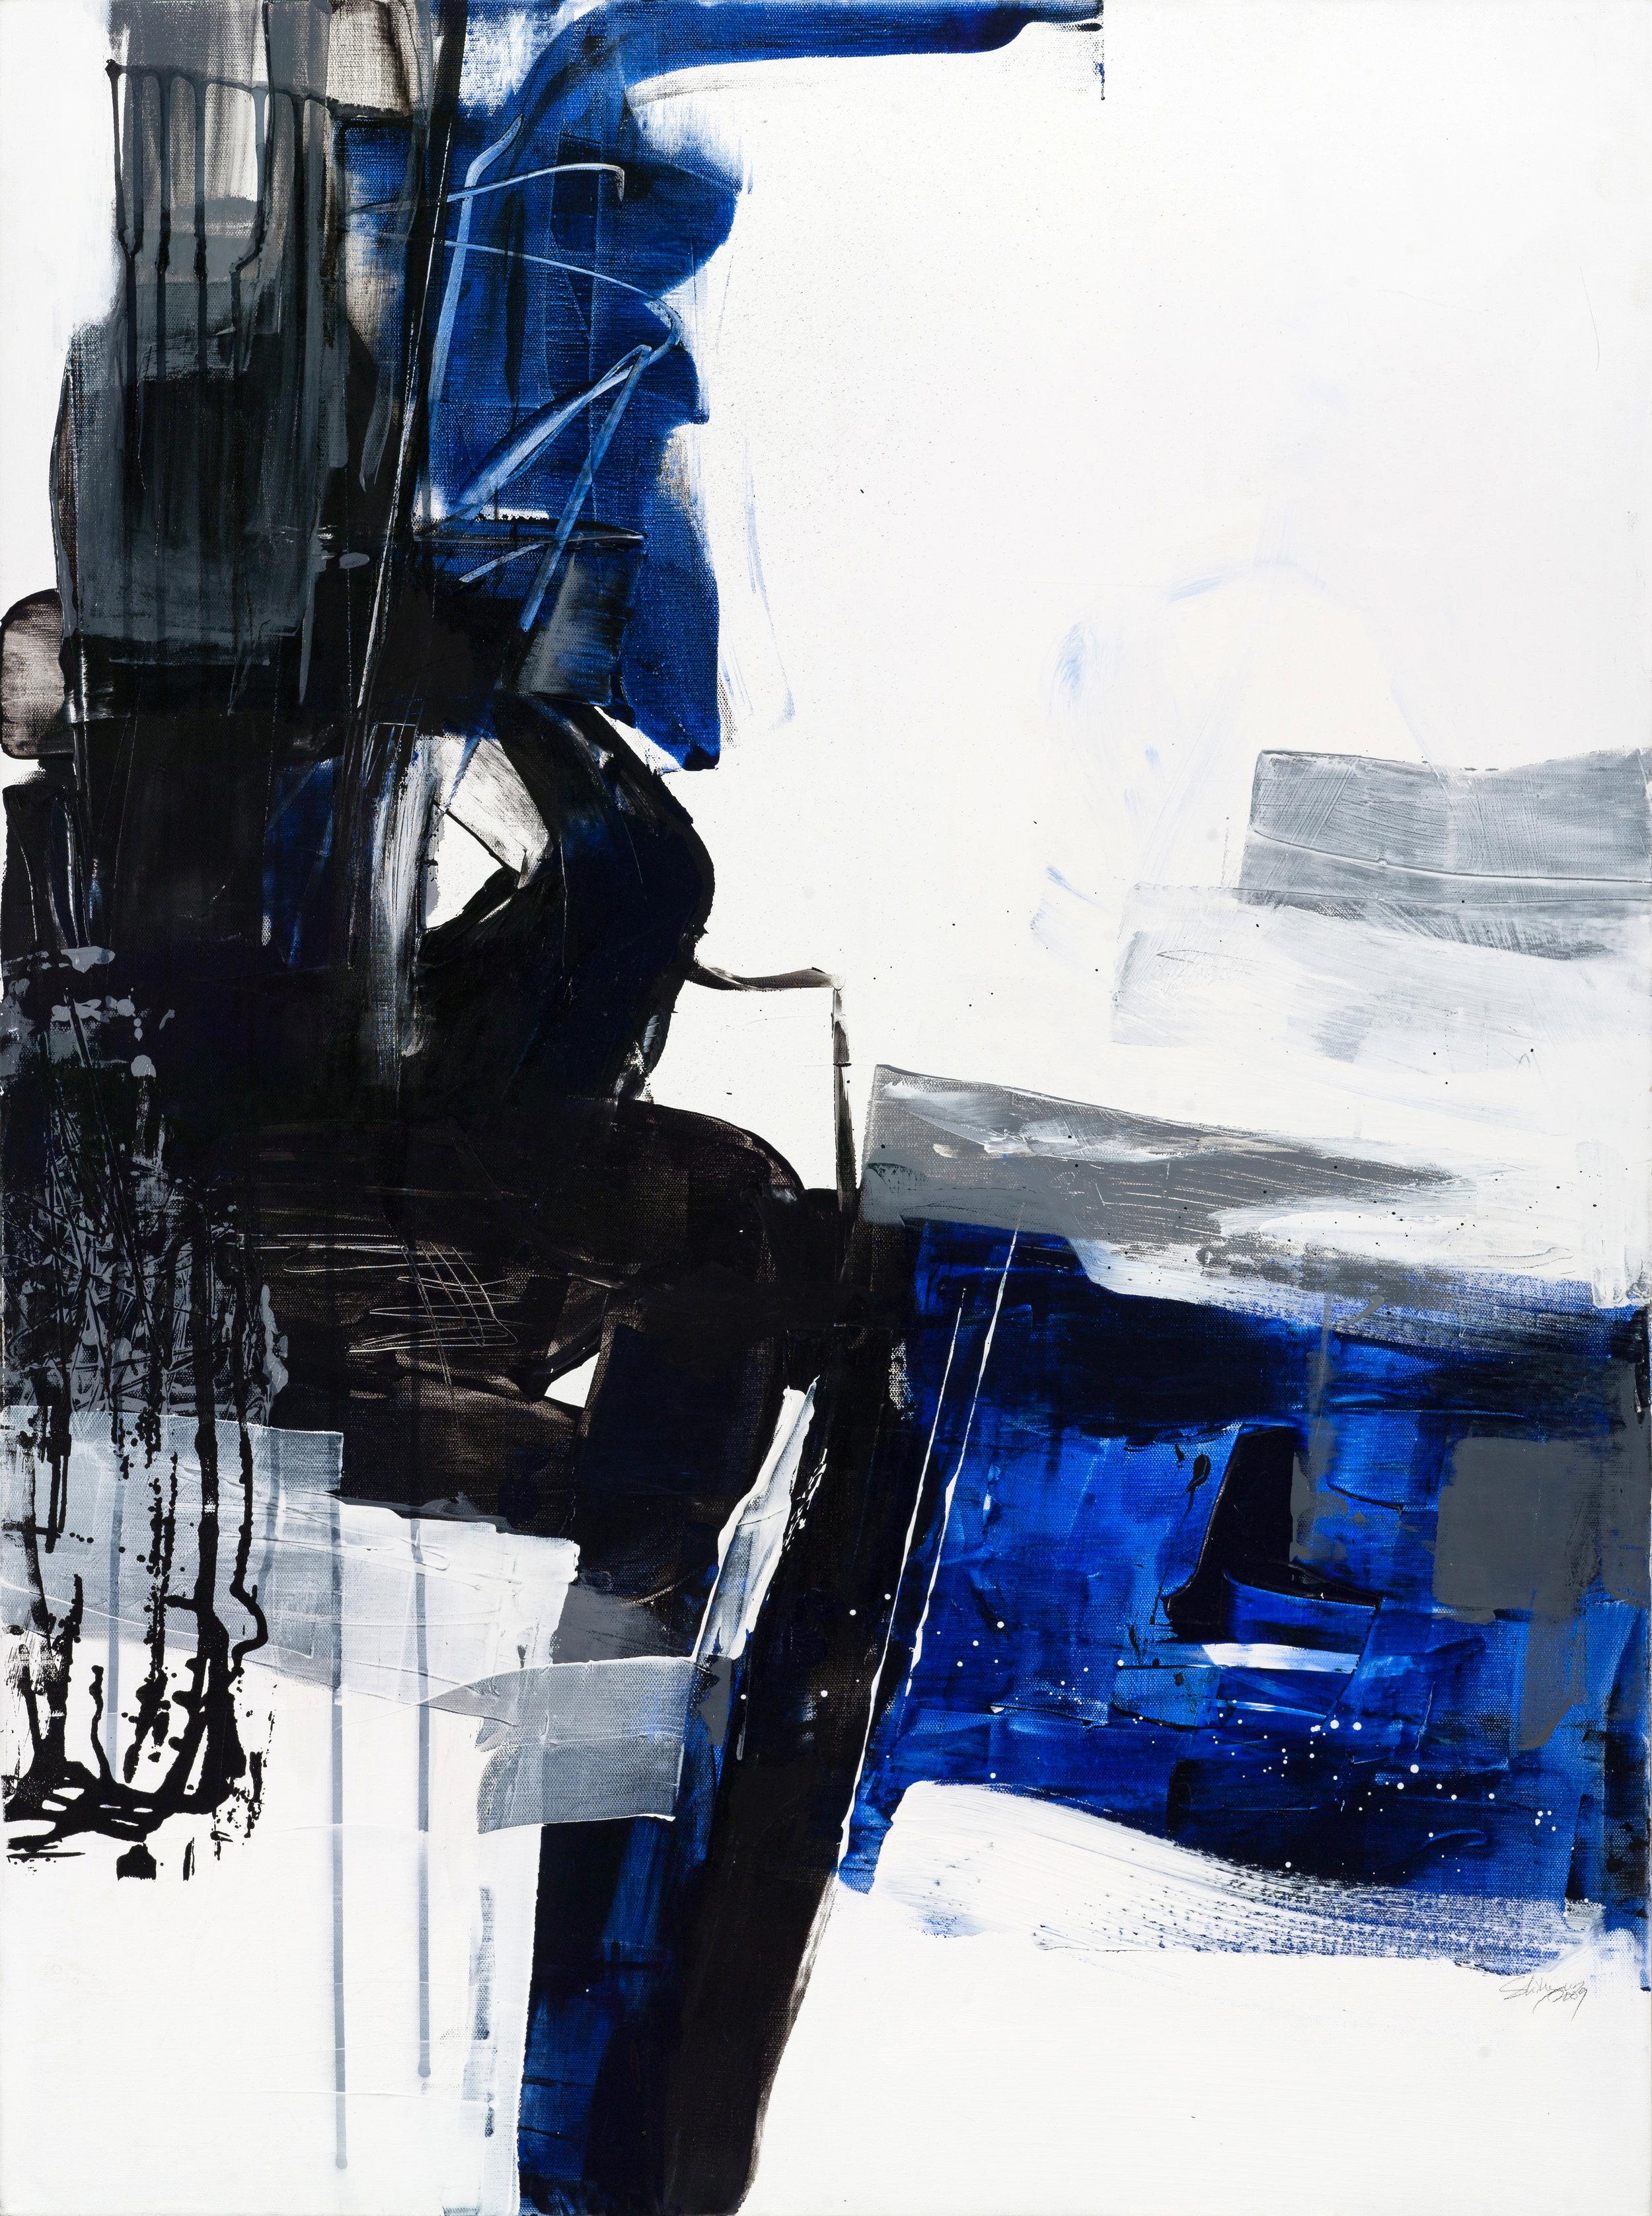 Defy #1 , 100 x 76 cm, mixed media on canvas, 2009